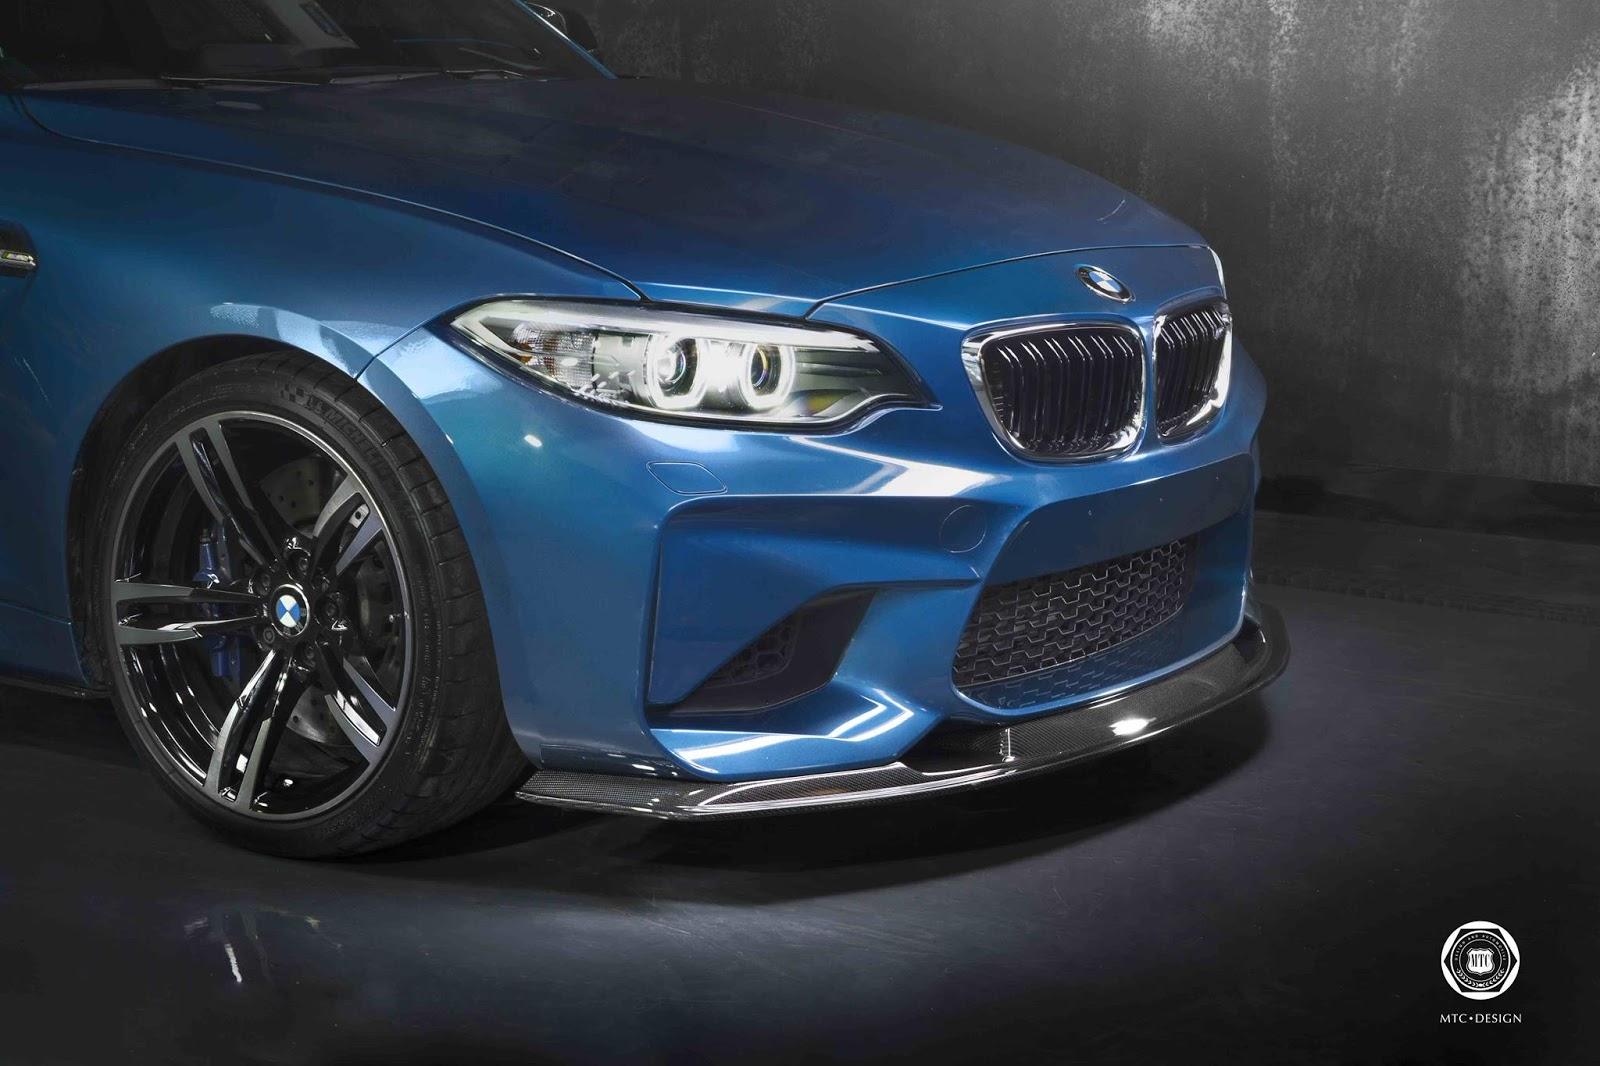 MTC-Design-BMW-M2-Tuning-F87-03